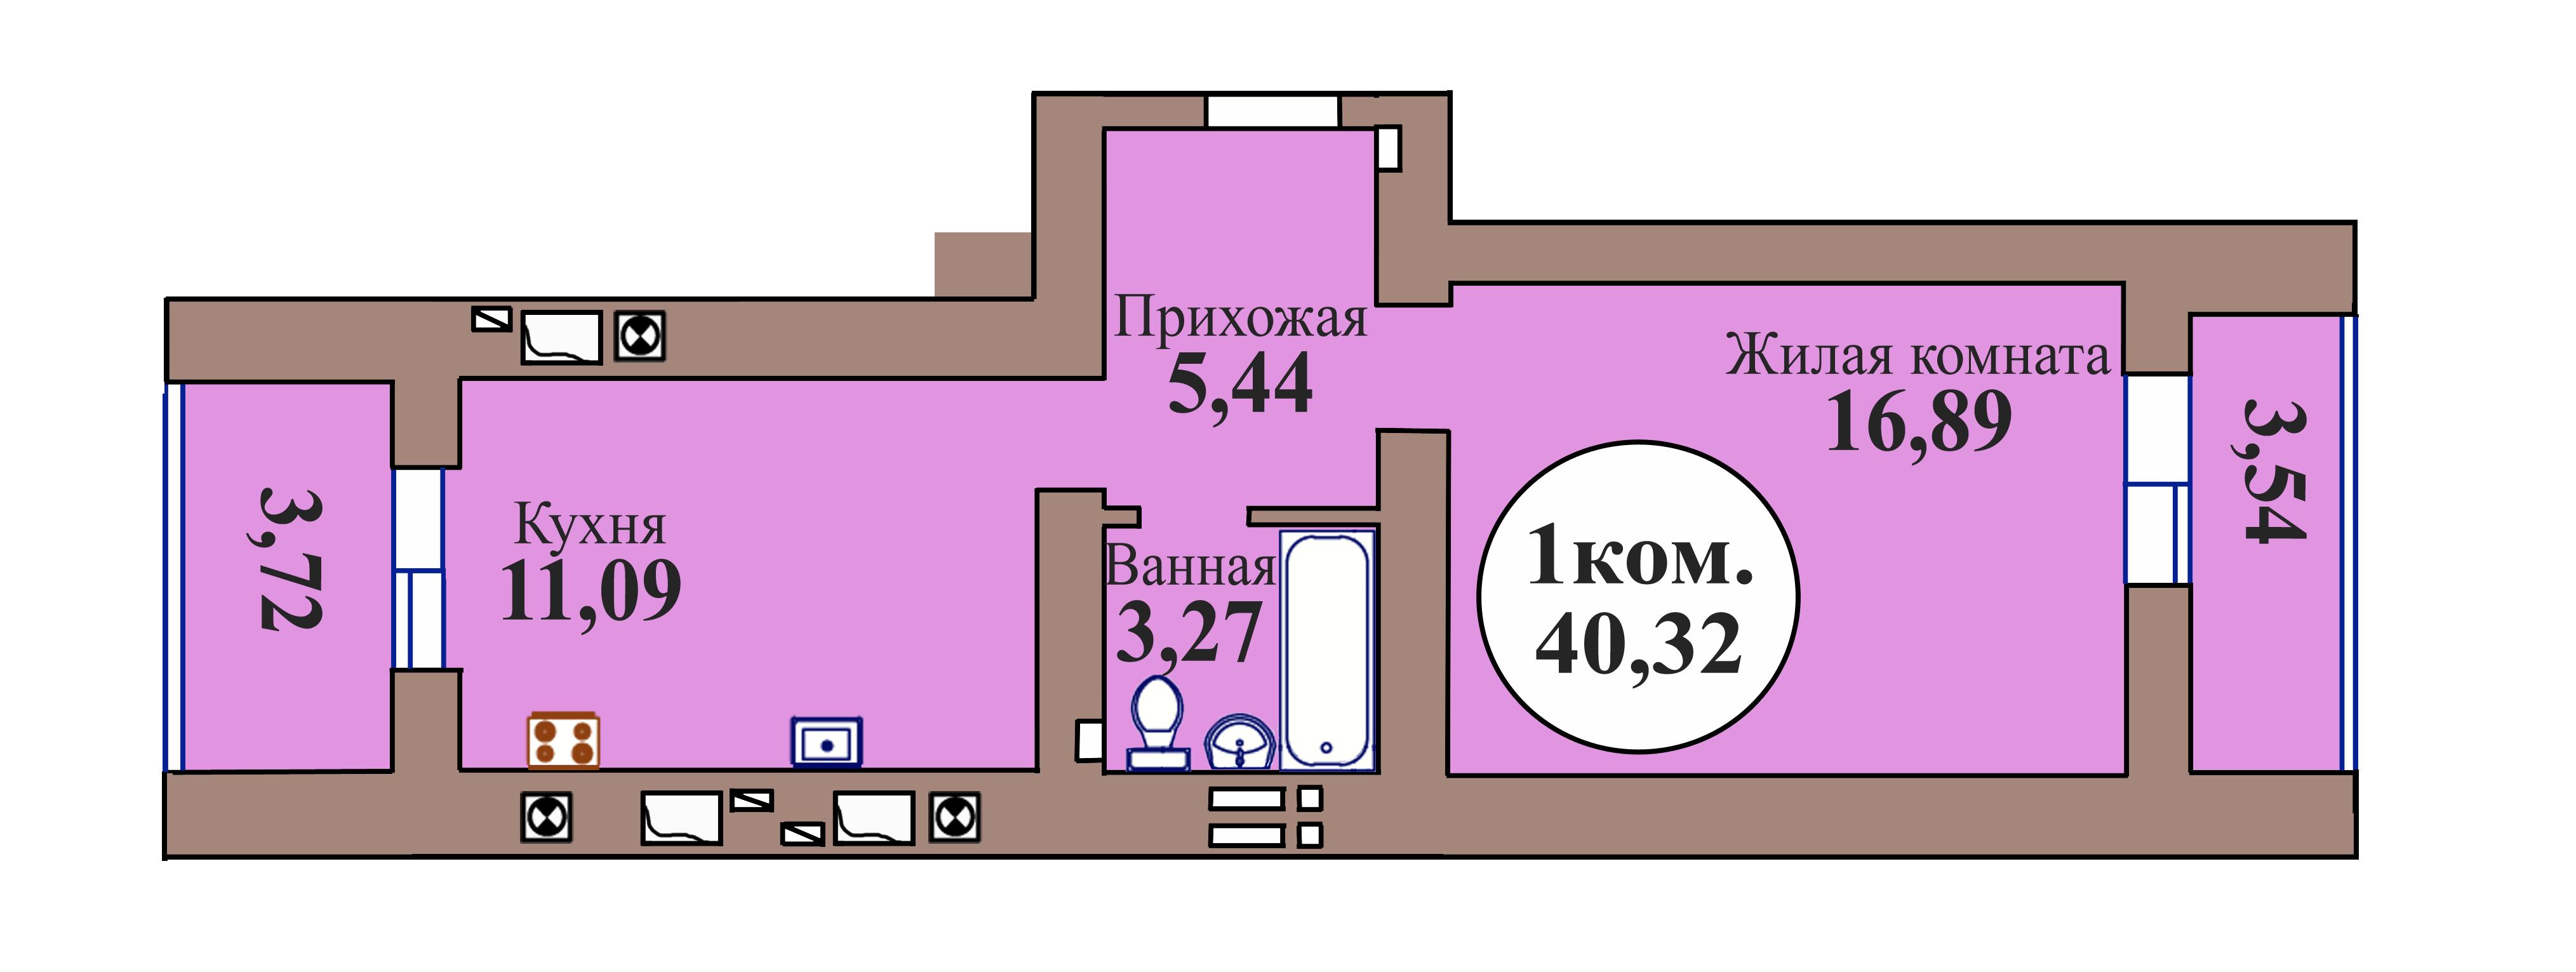 1-комн. кв. по пер. Калининградский, 5 кв. 34 в Калининграде